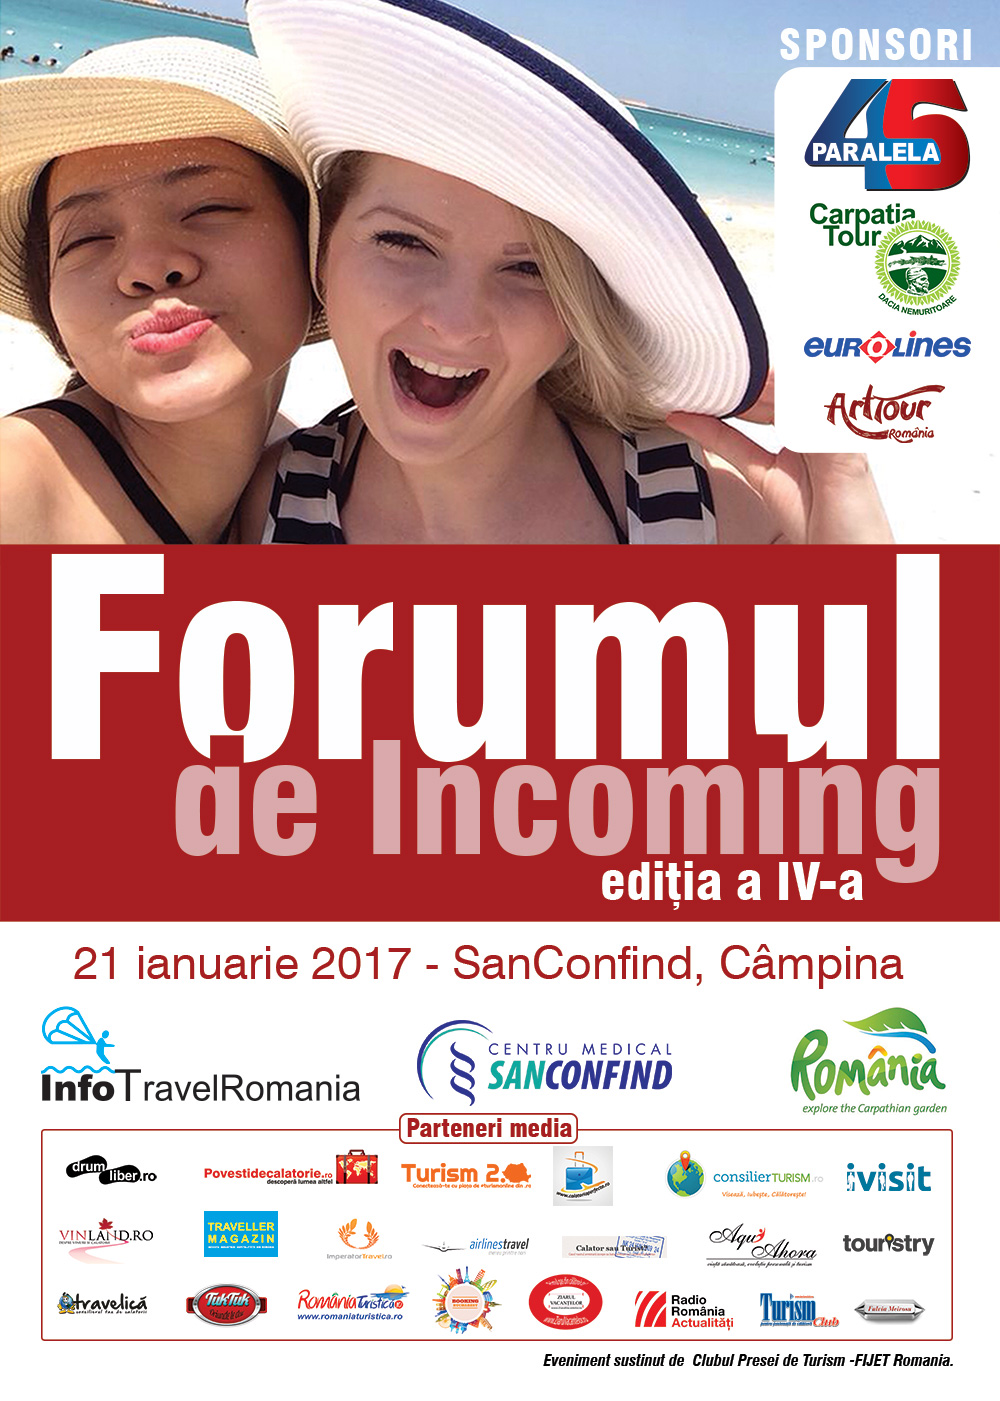 Forumul de Incoming editia IV